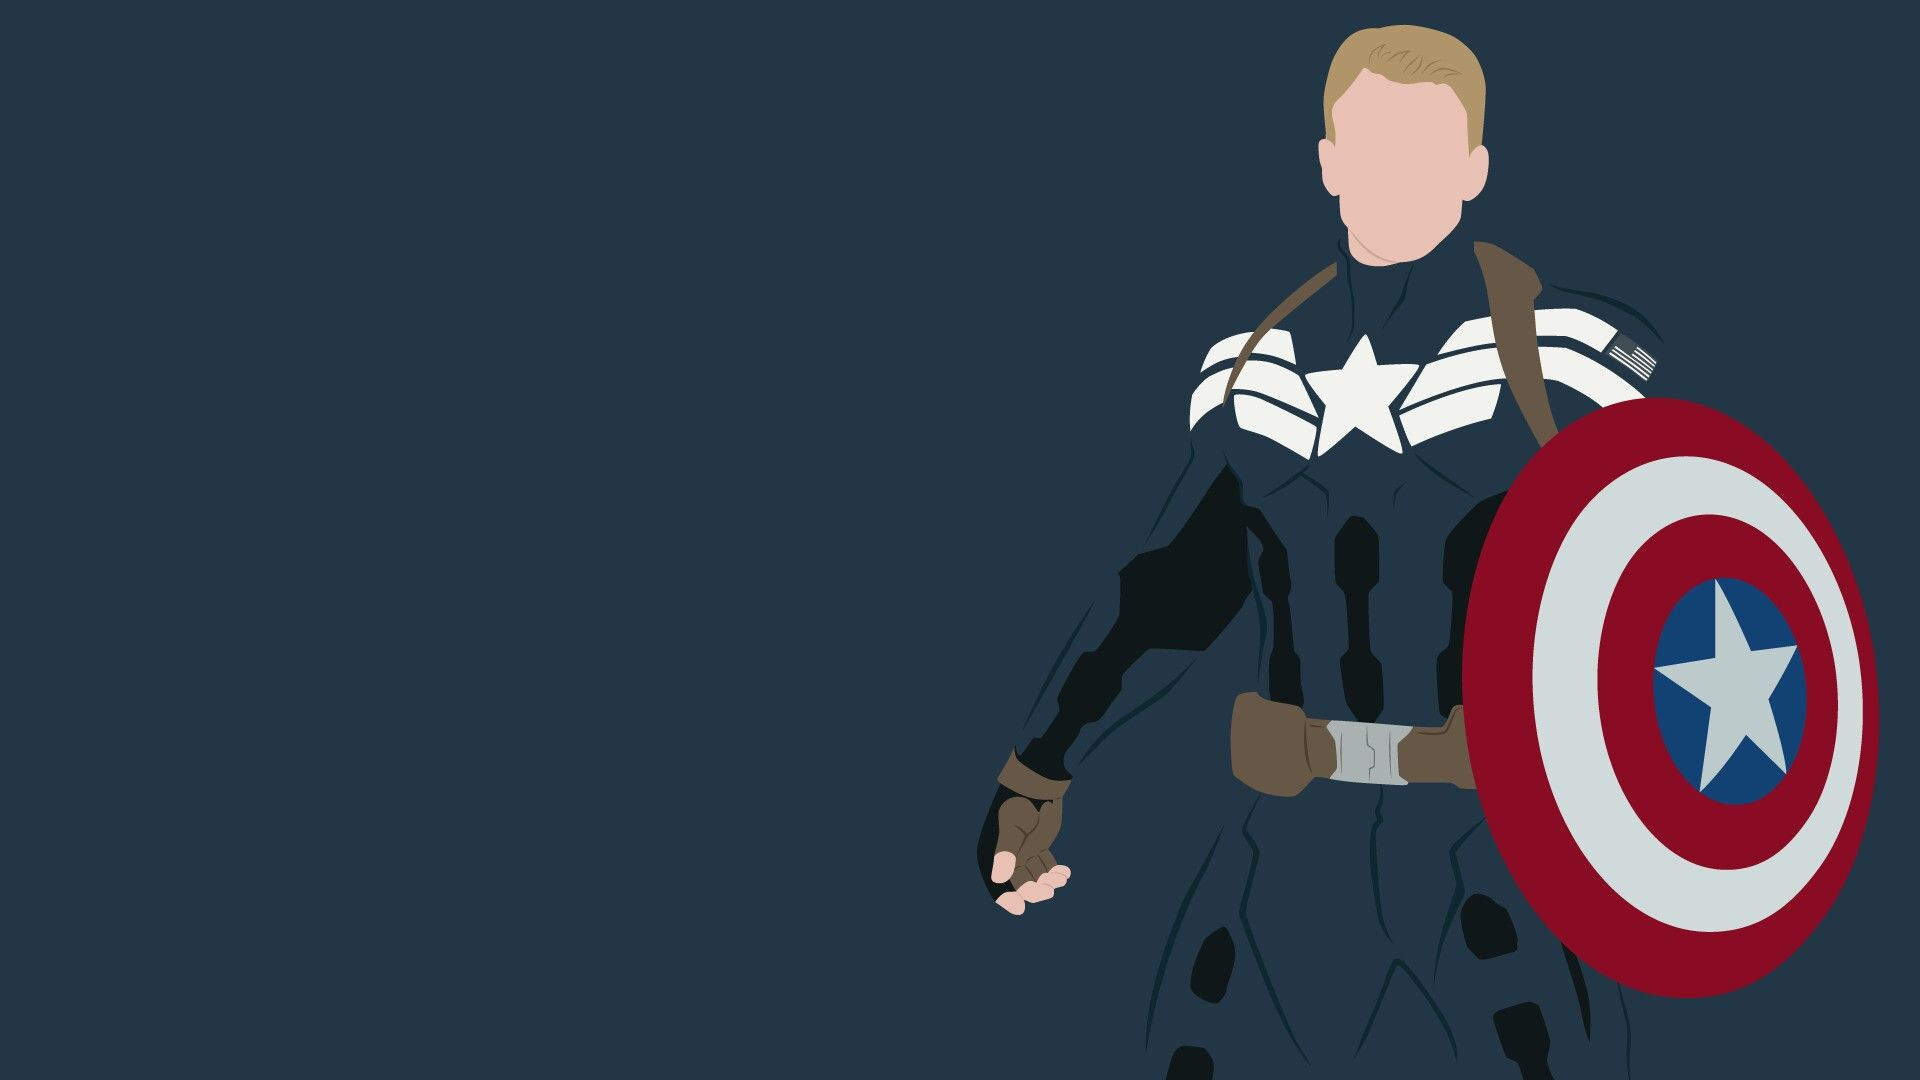 Minimalist Captain America Wallpapers Top Free Minimalist Captain America Backgrounds Wallpaperaccess